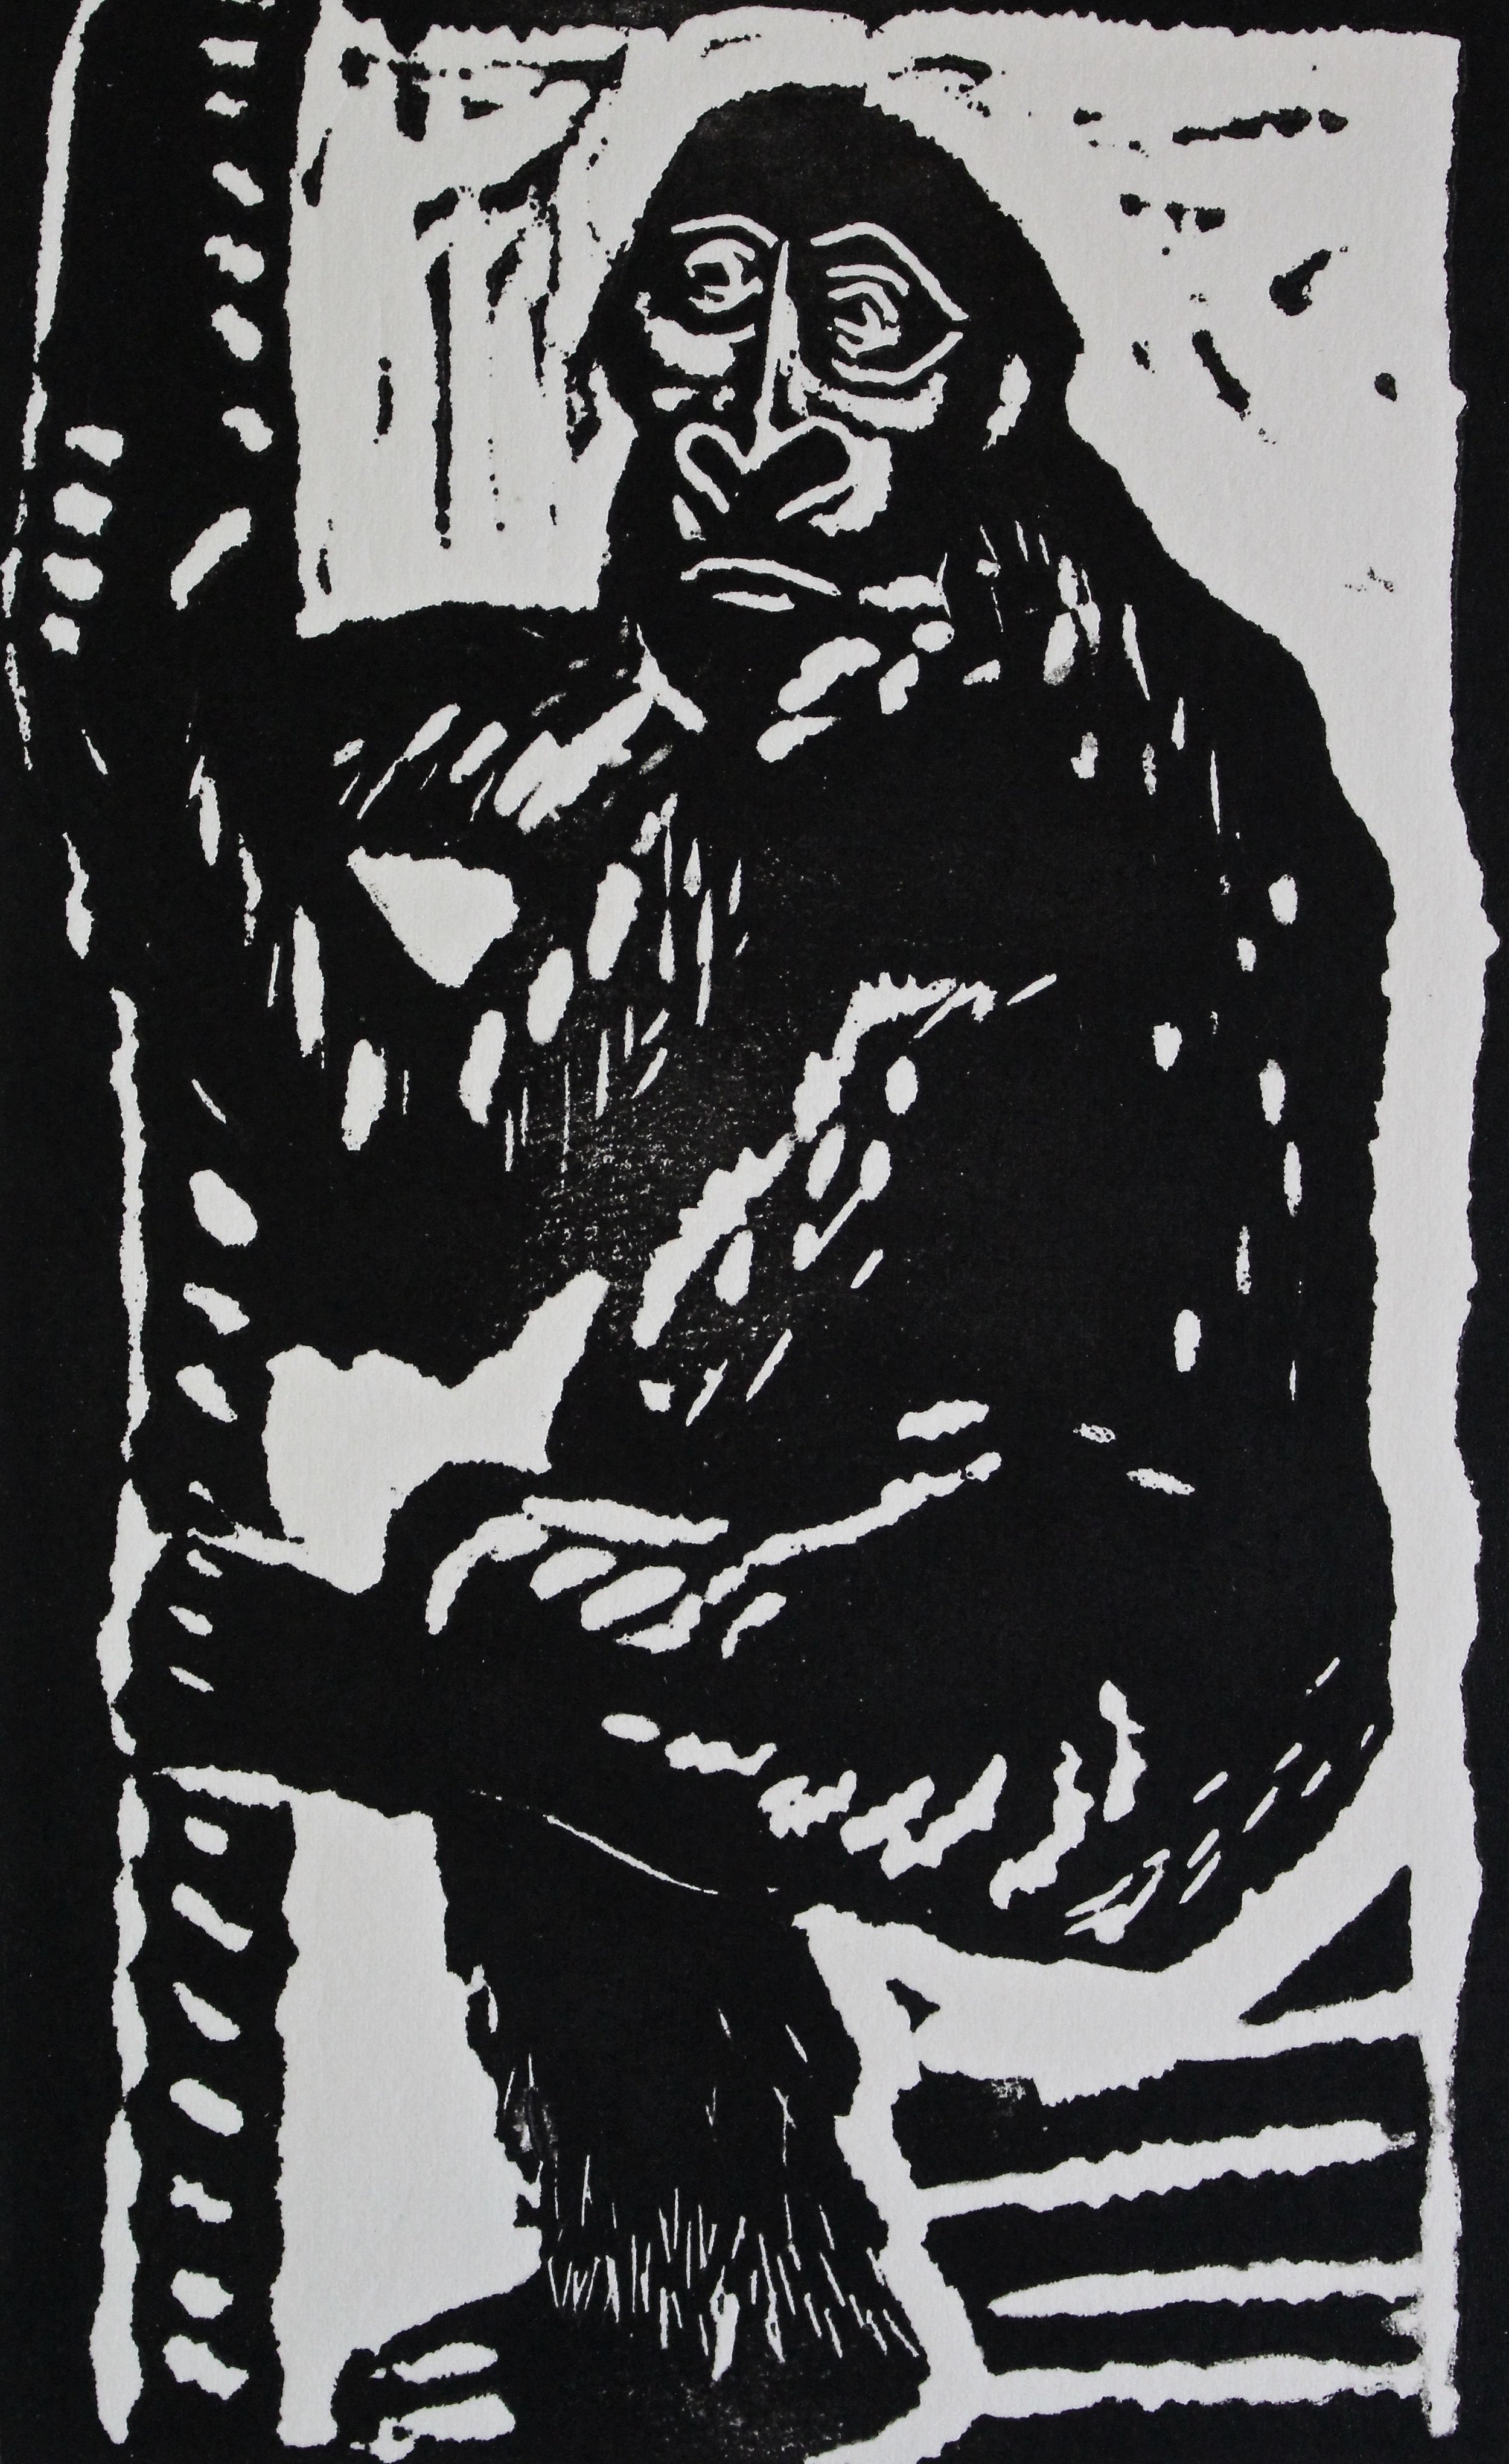 """Untitled"" (3/10) - ""Edwar El Kharrat Artist's Book Series"""